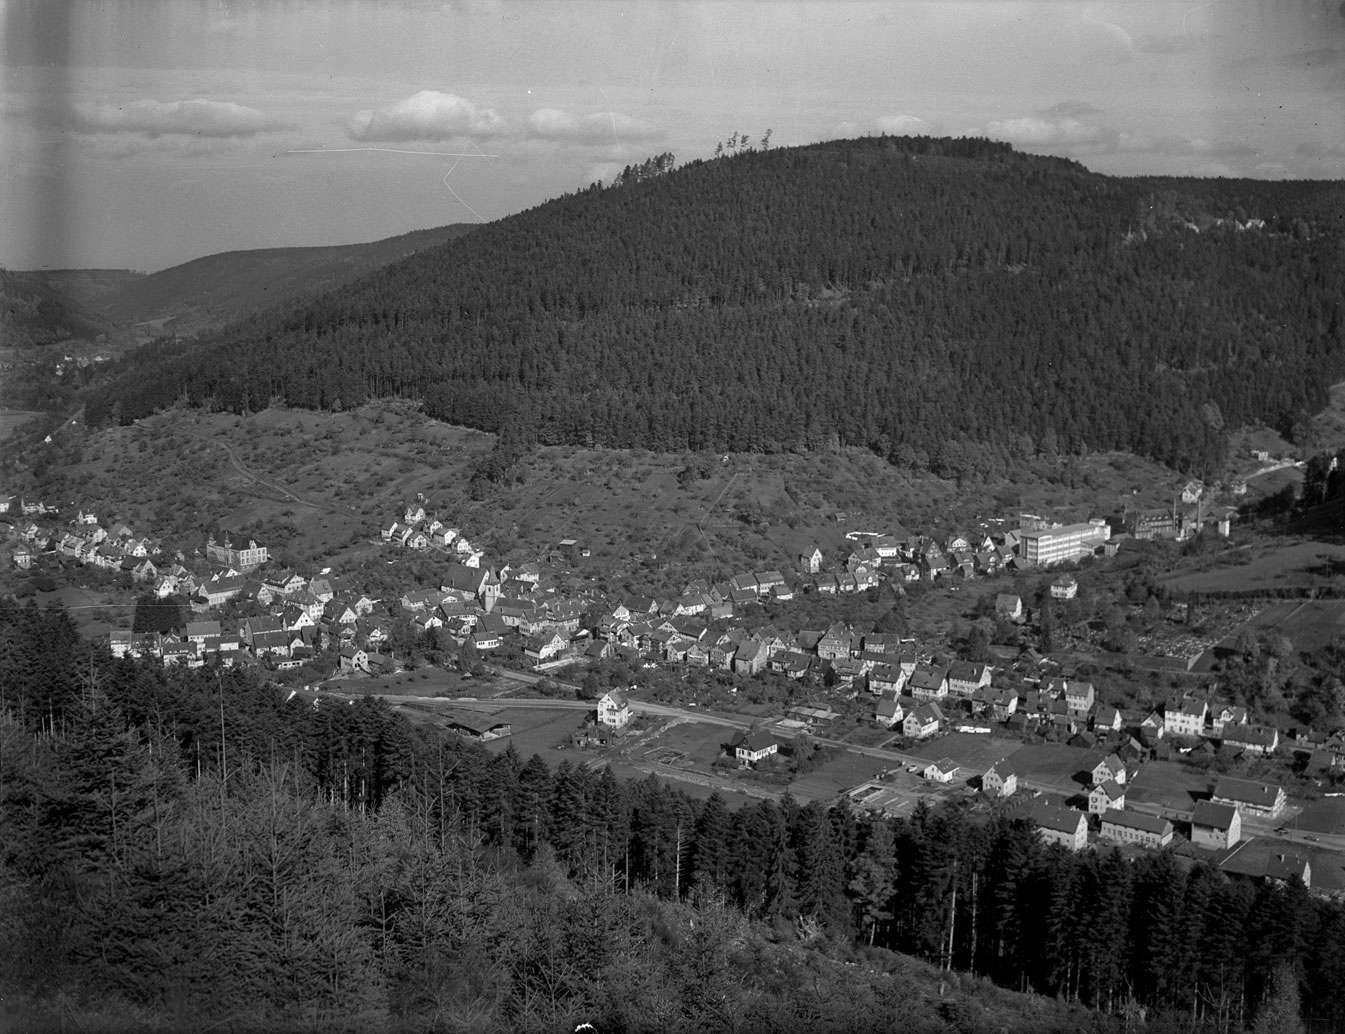 Dokumentation Wildbad und Calmbach (2), Nr 002